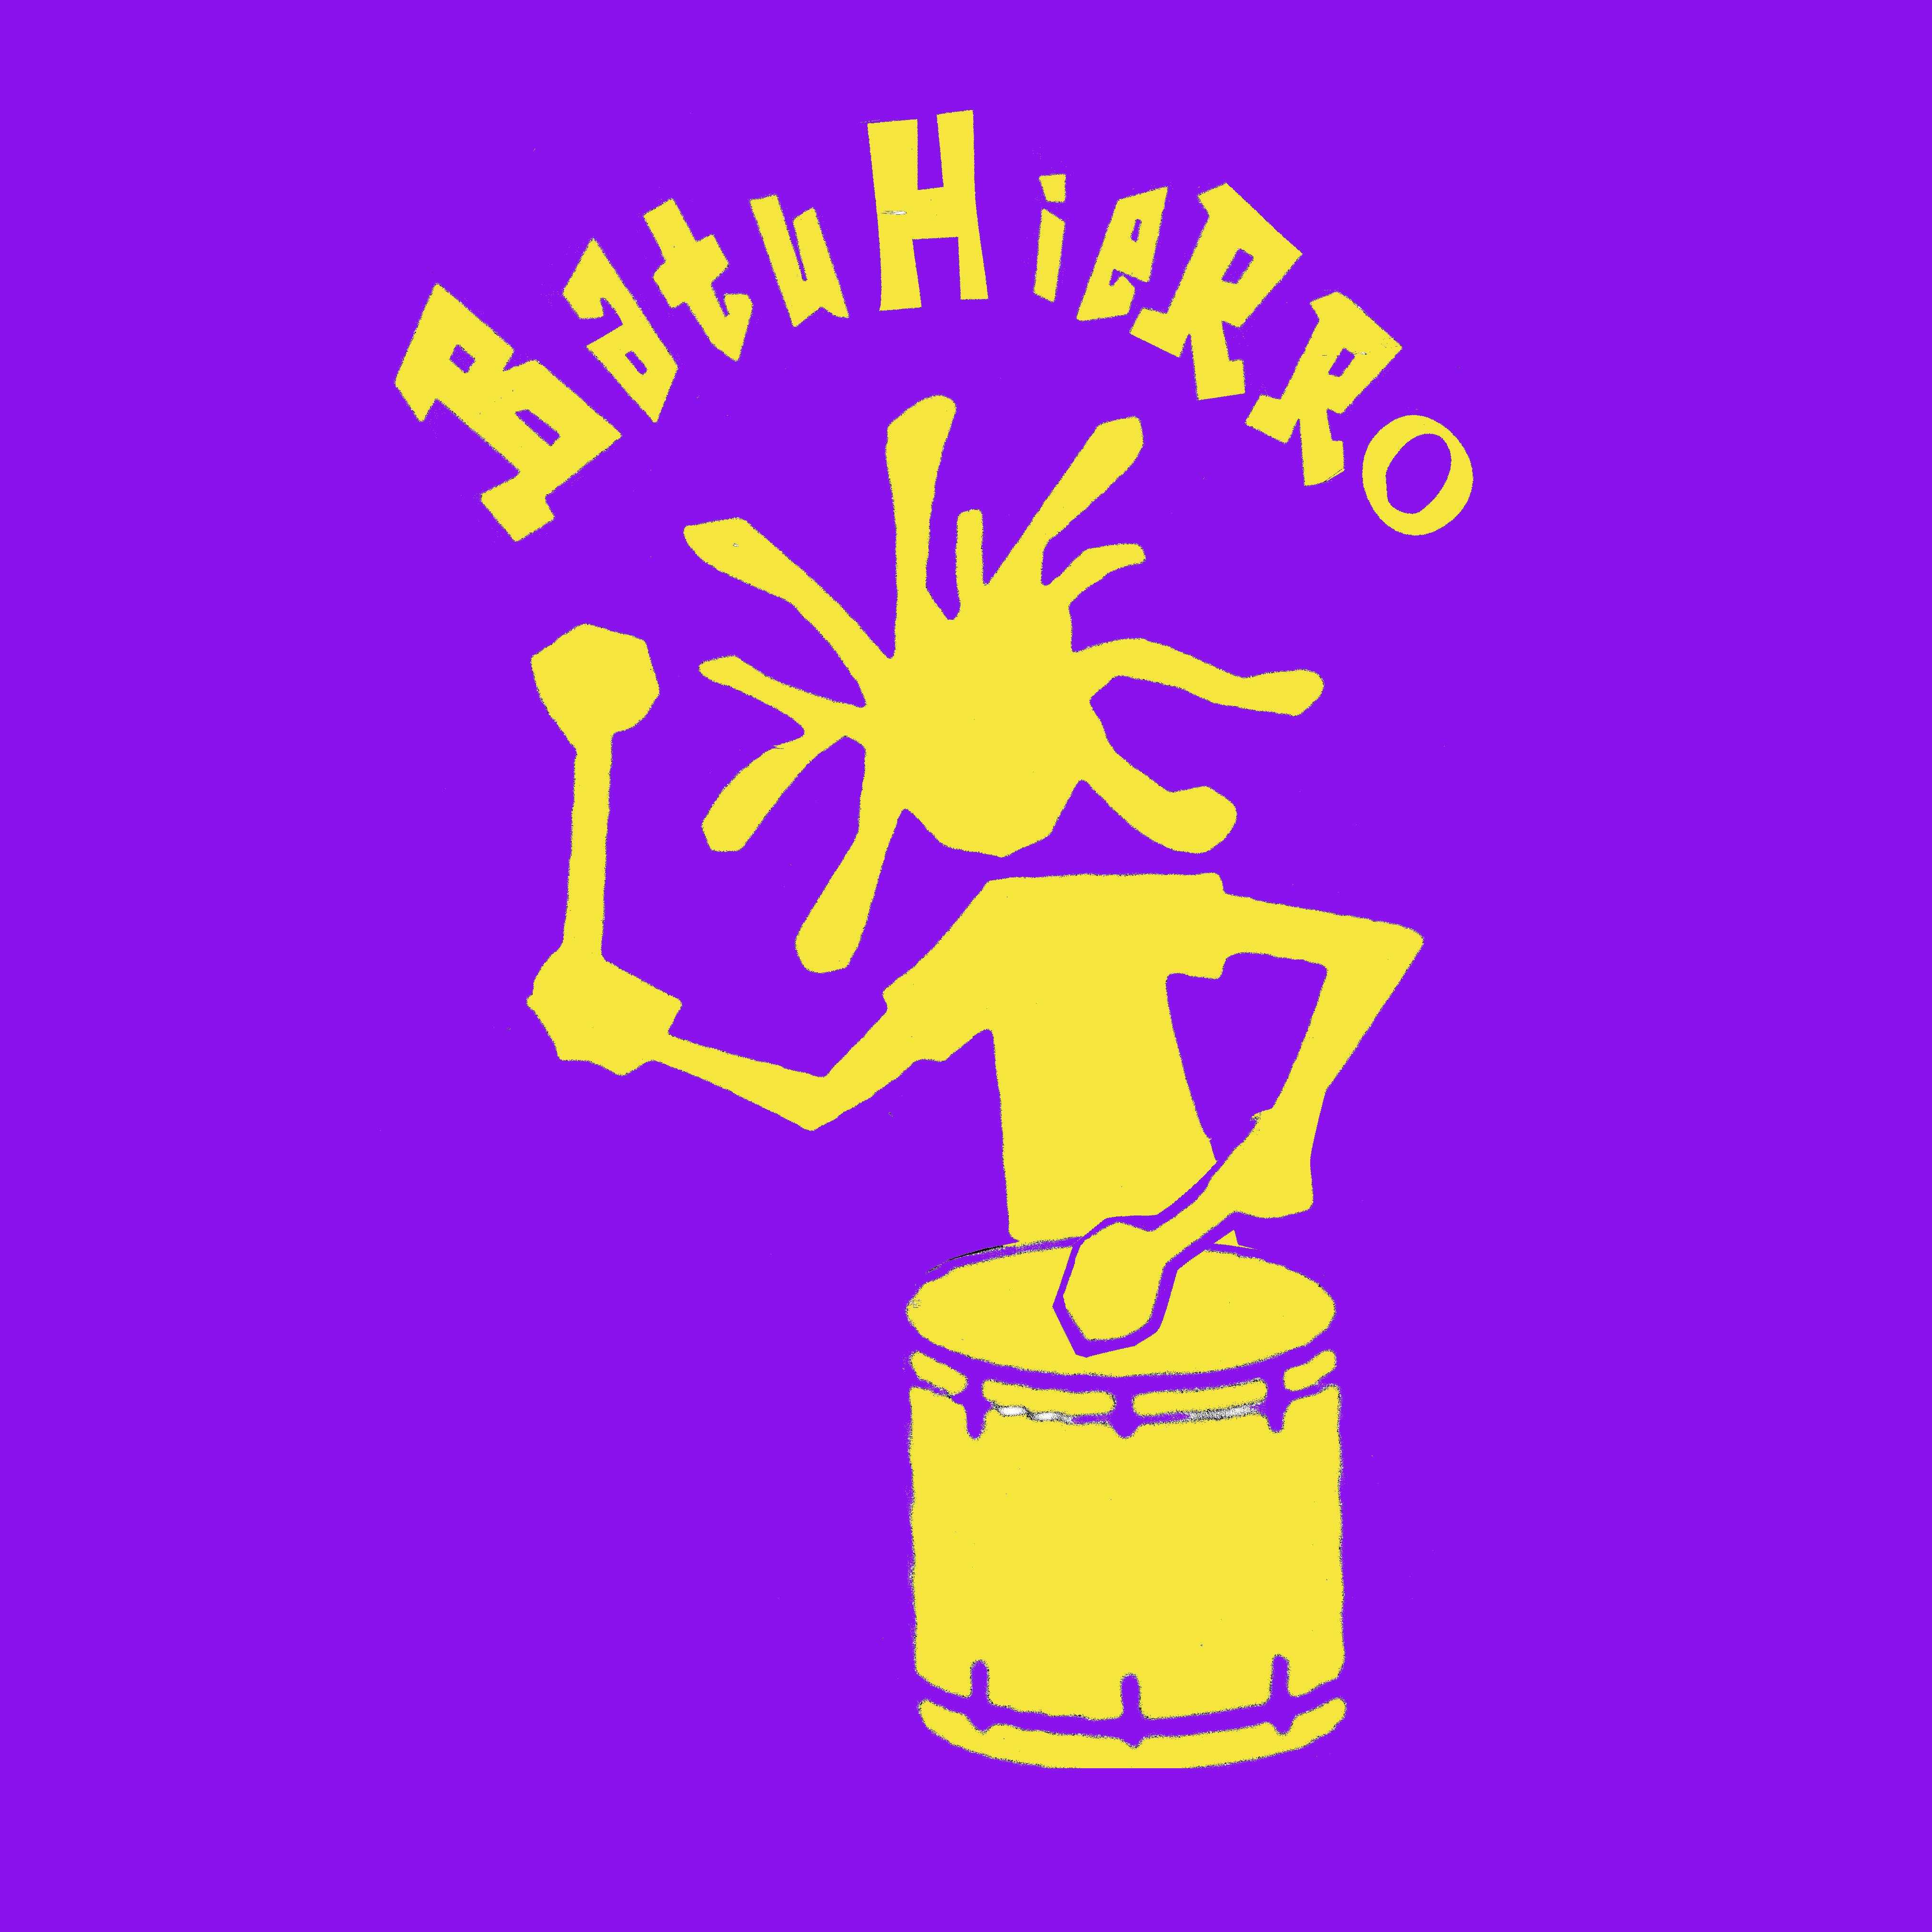 Batuhierro - Su perfil. Votar, valora y comunicate